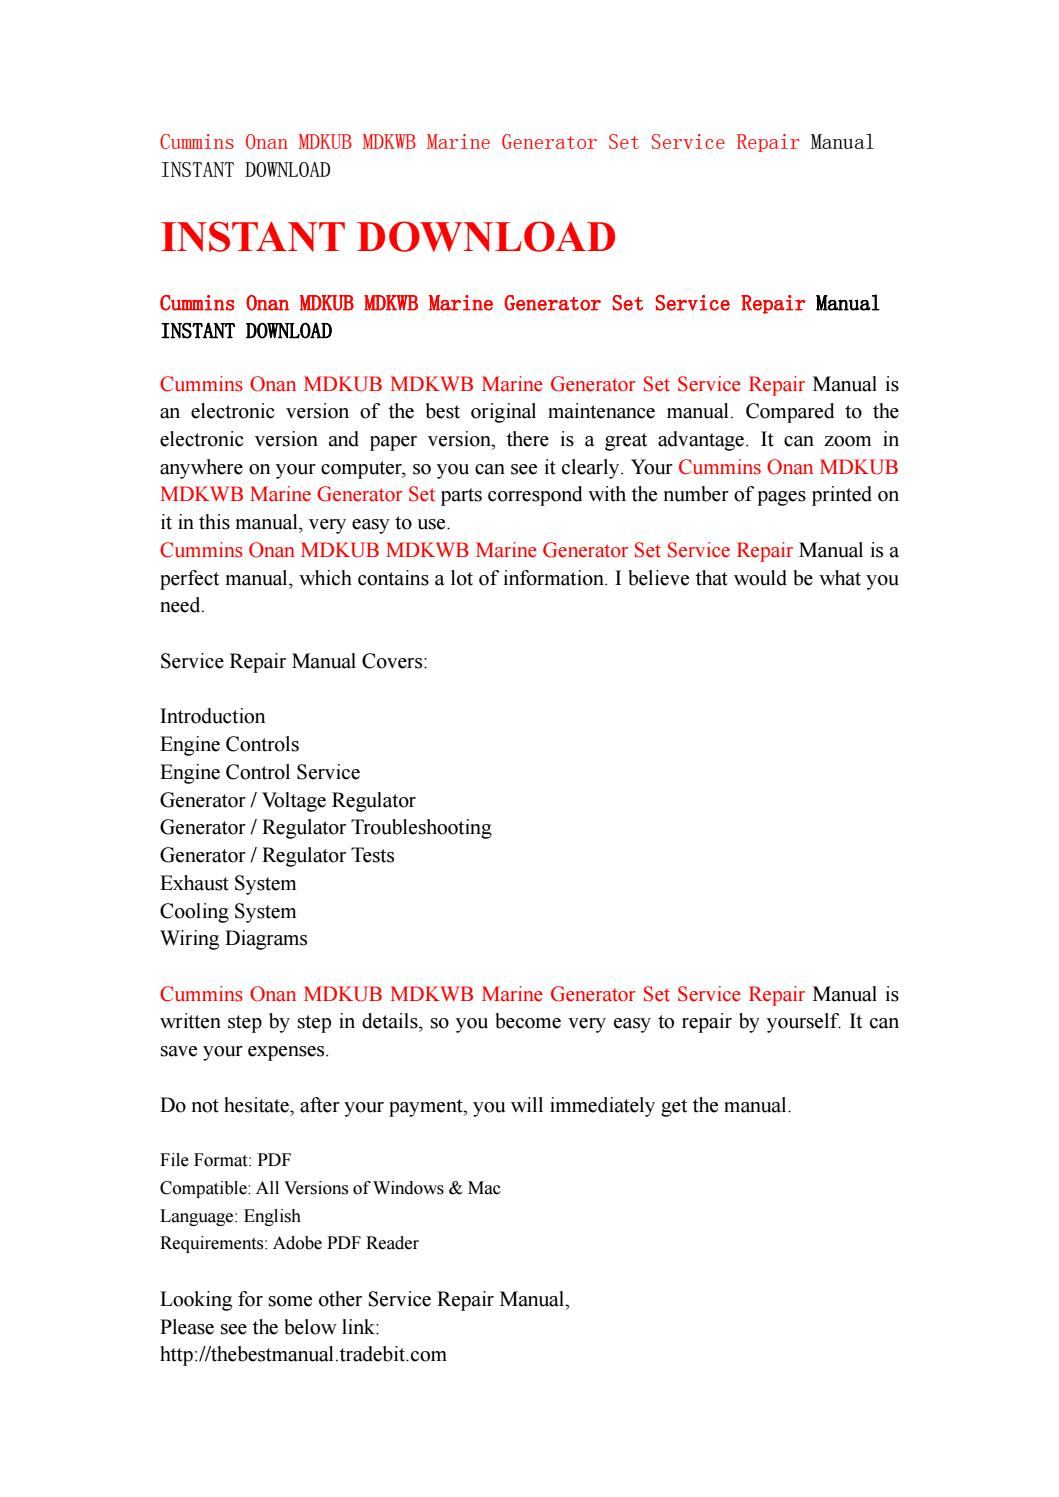 Cummins Onan Mdkub Mdkwb Marine Generator Set Service Repair Manual Wiring Diagrams Instant Download By Kjjsefhsjef Issuu